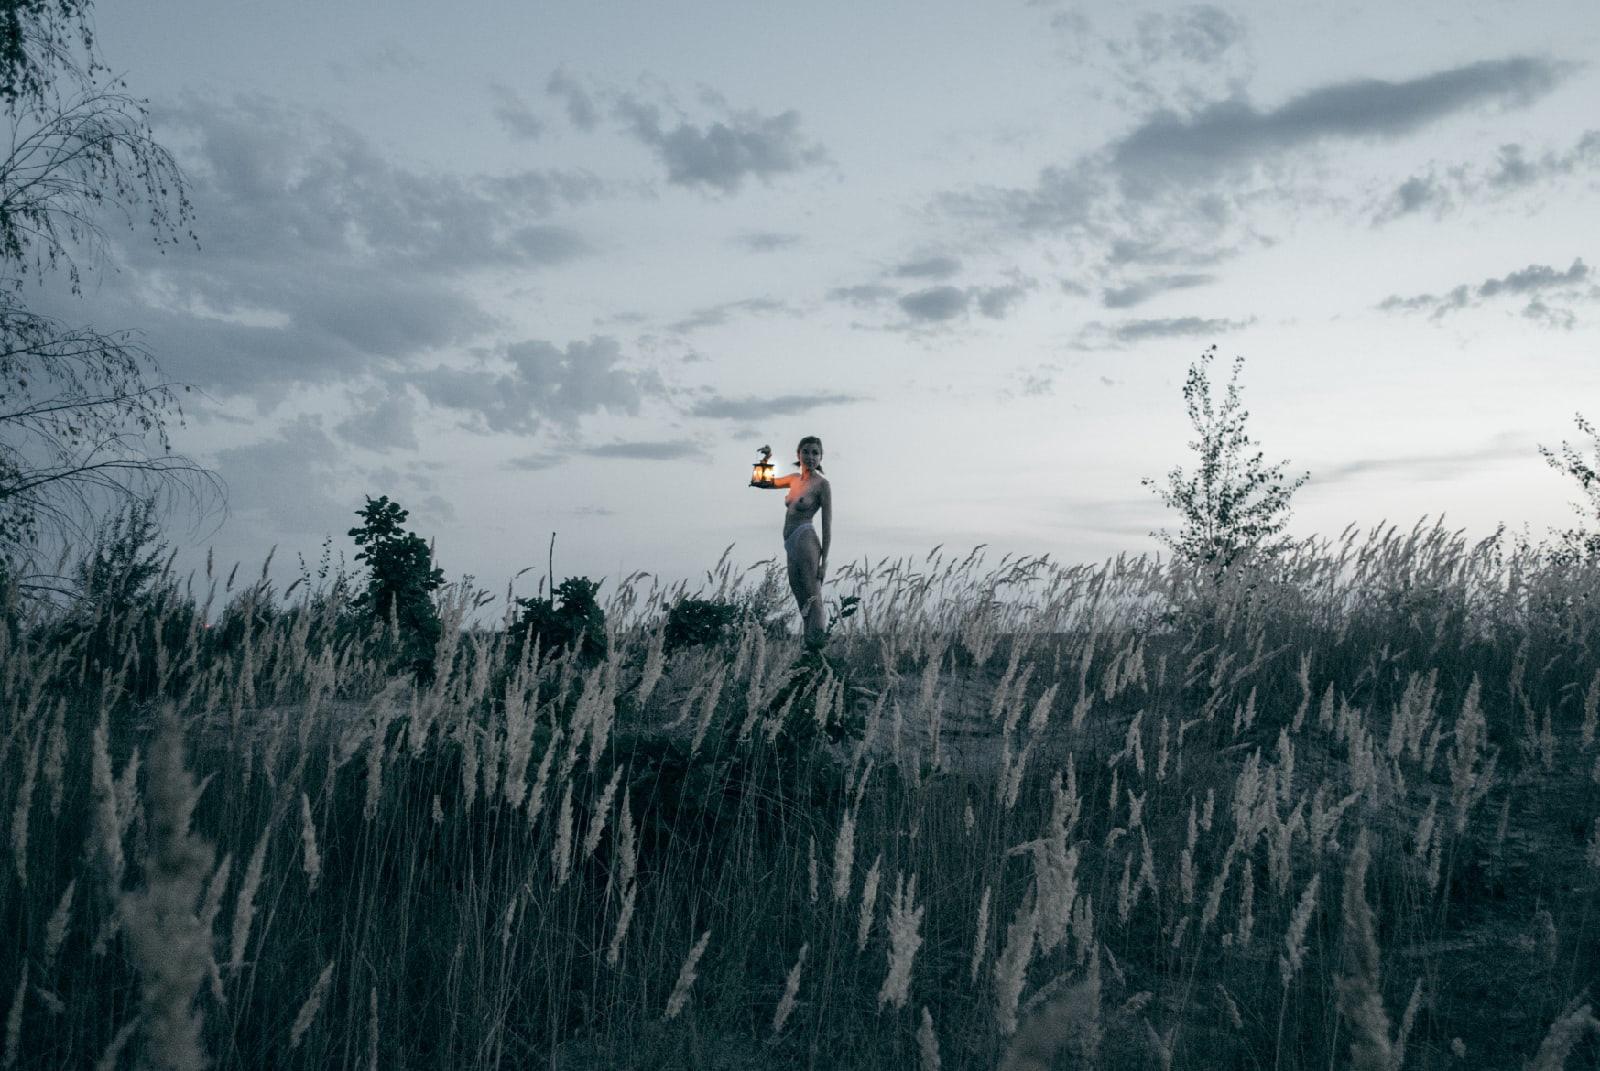 https://www.youngfolks.ru/pub/photographer-svyatoslav-kuznetsov